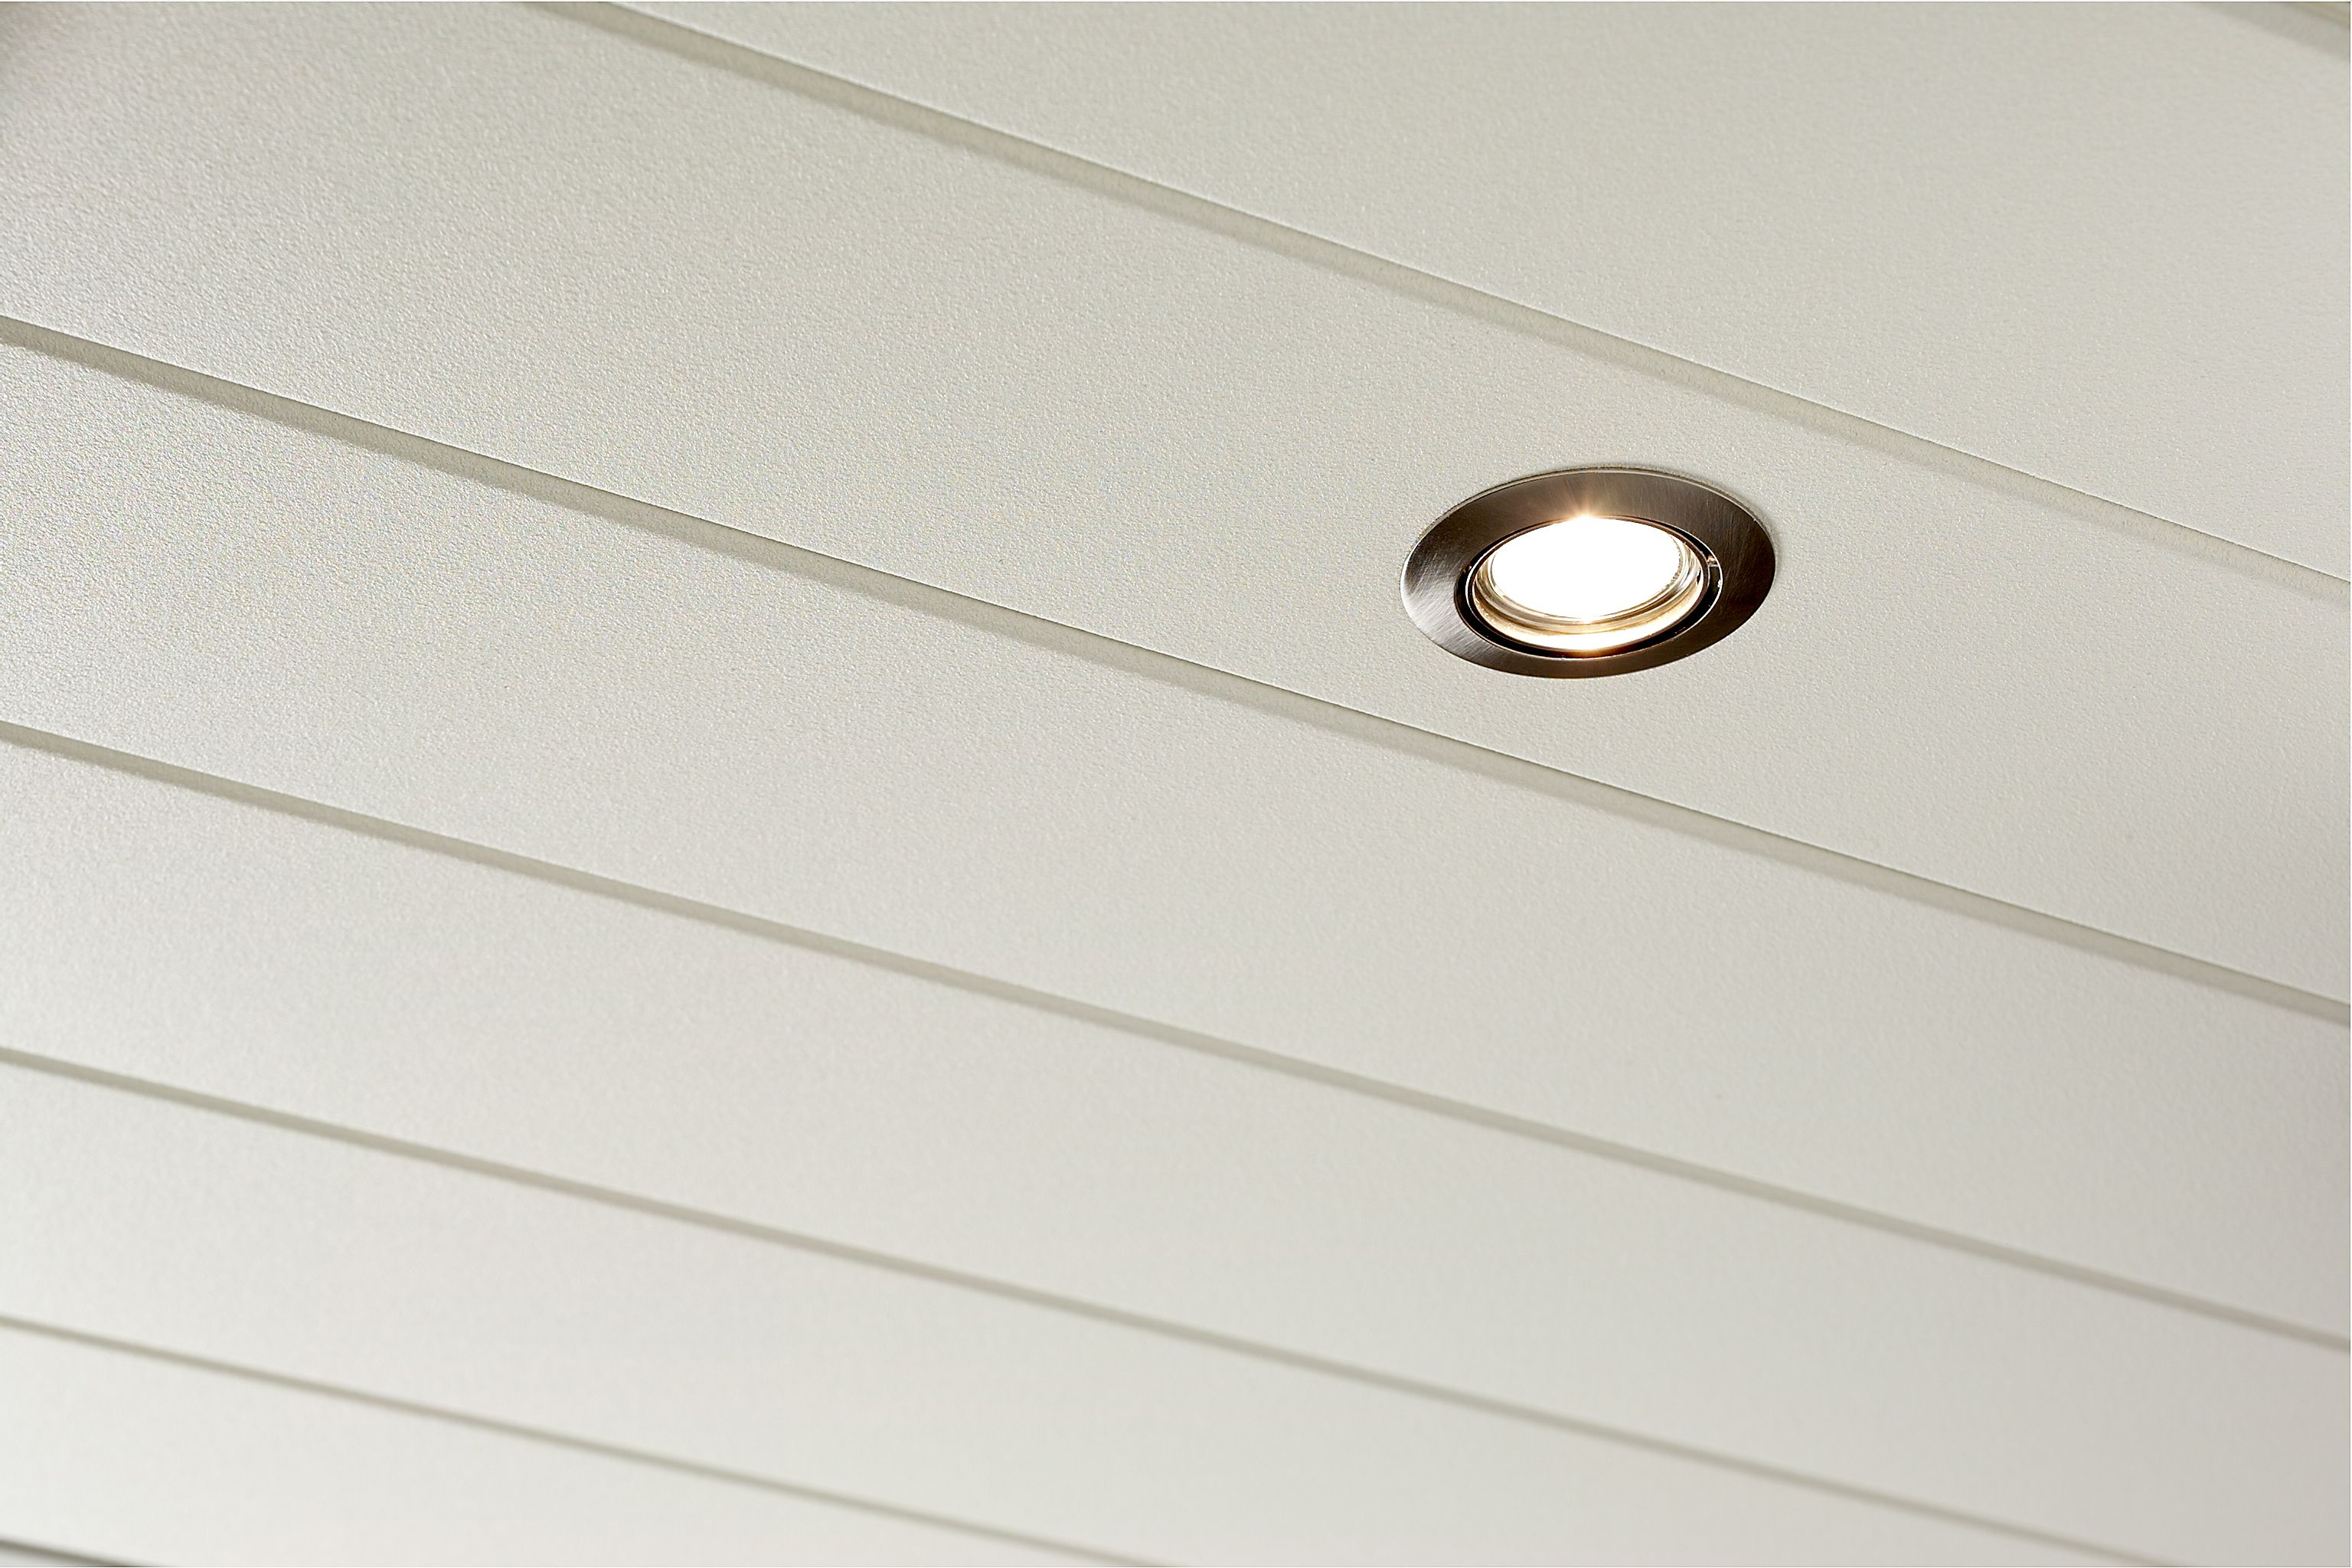 Aluminium Luxalon badkamer plafond met ingebouwde (LED)-verlichting ...